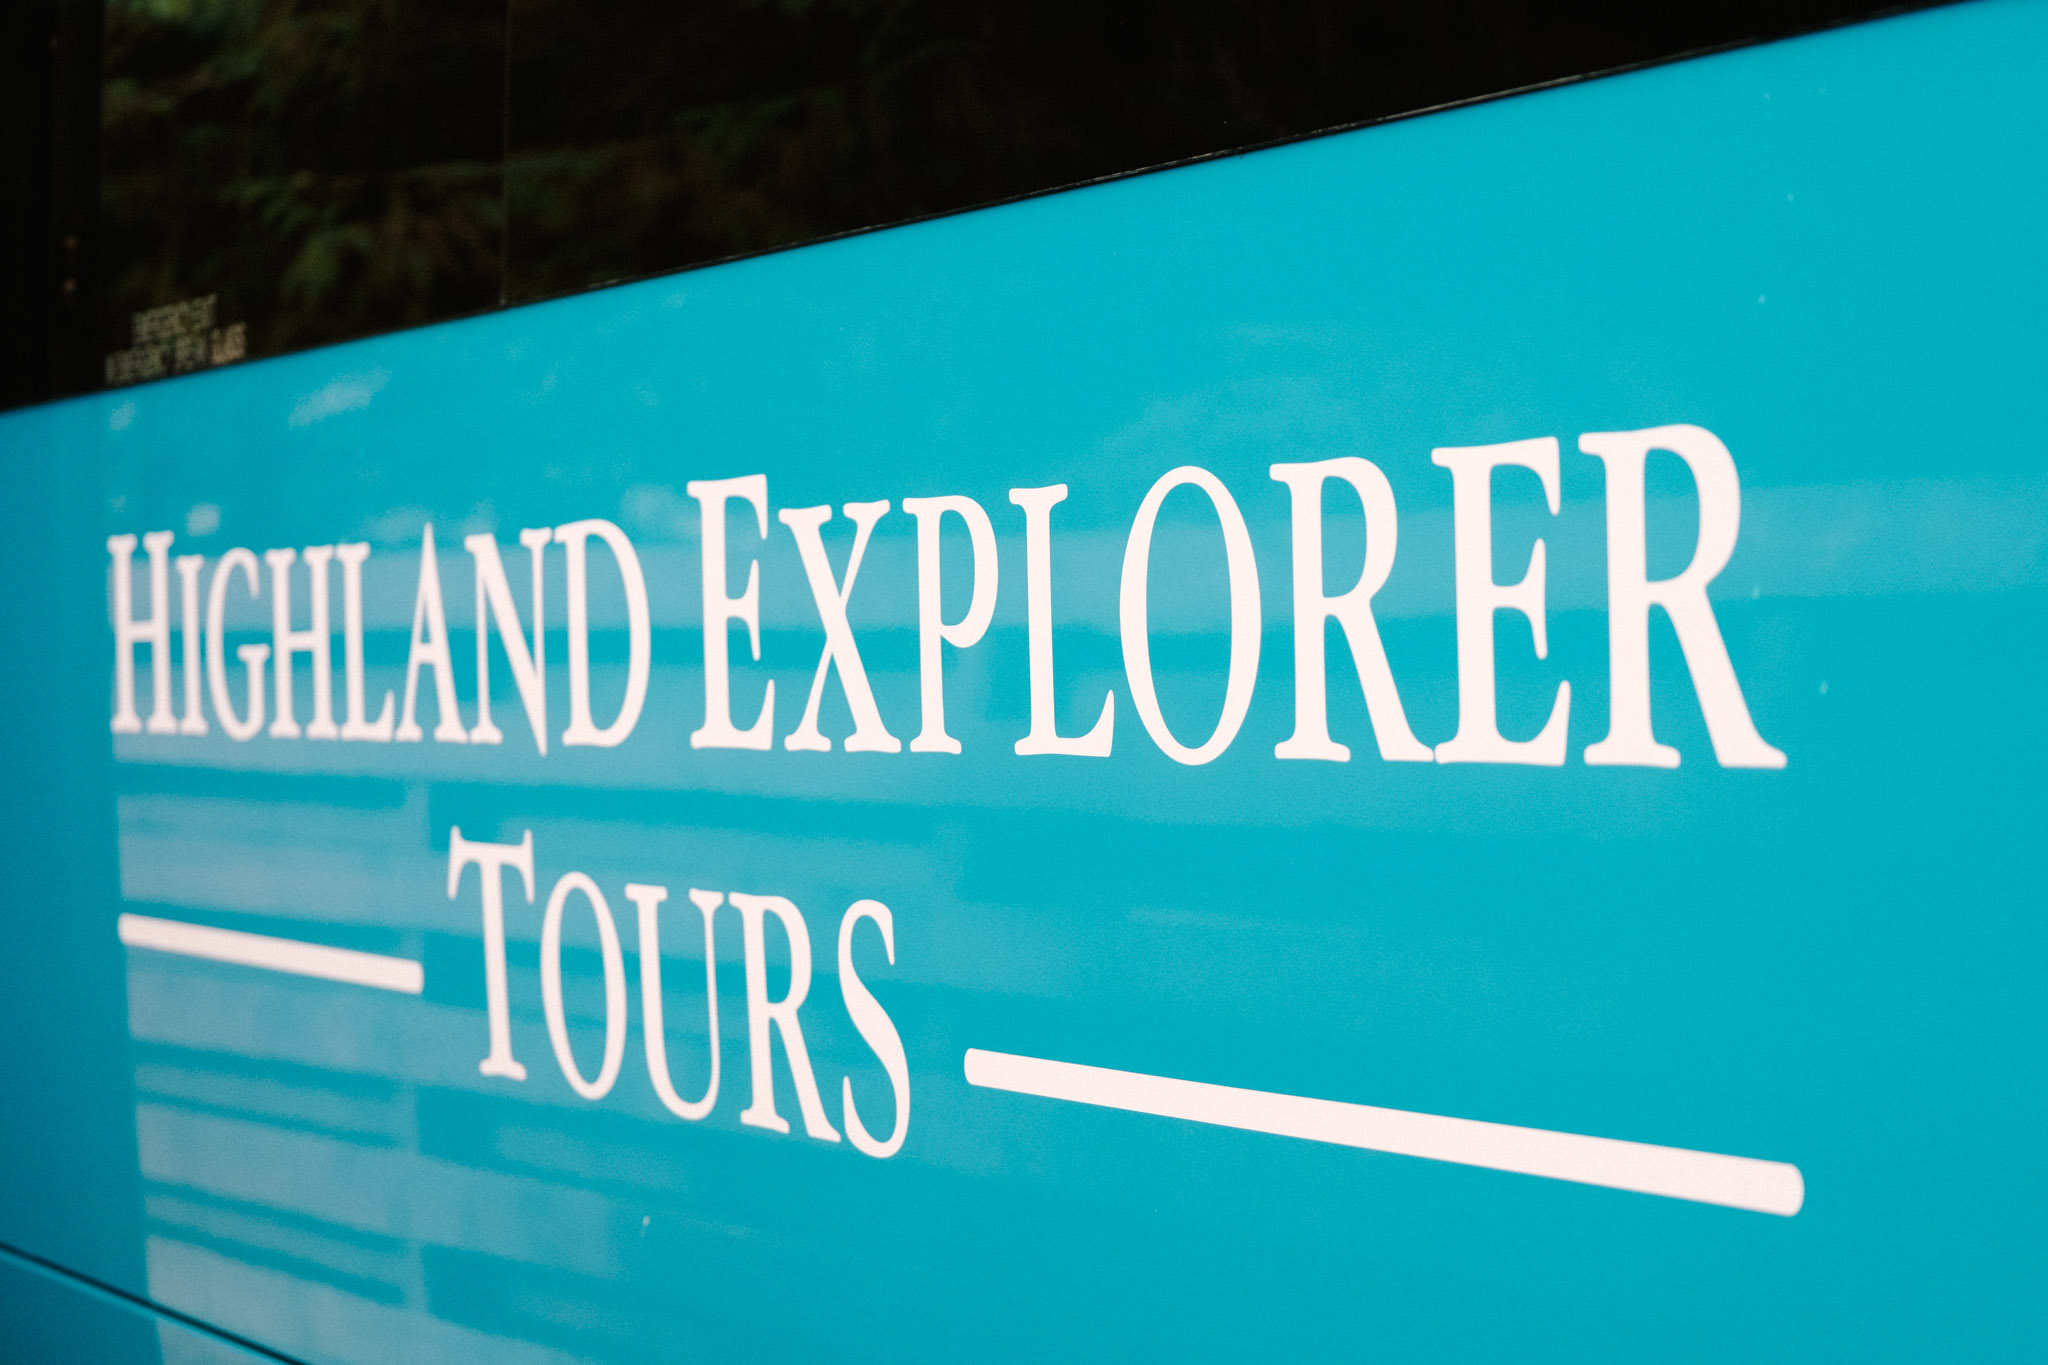 Highland Explorer Tours-160725-180253.jpg